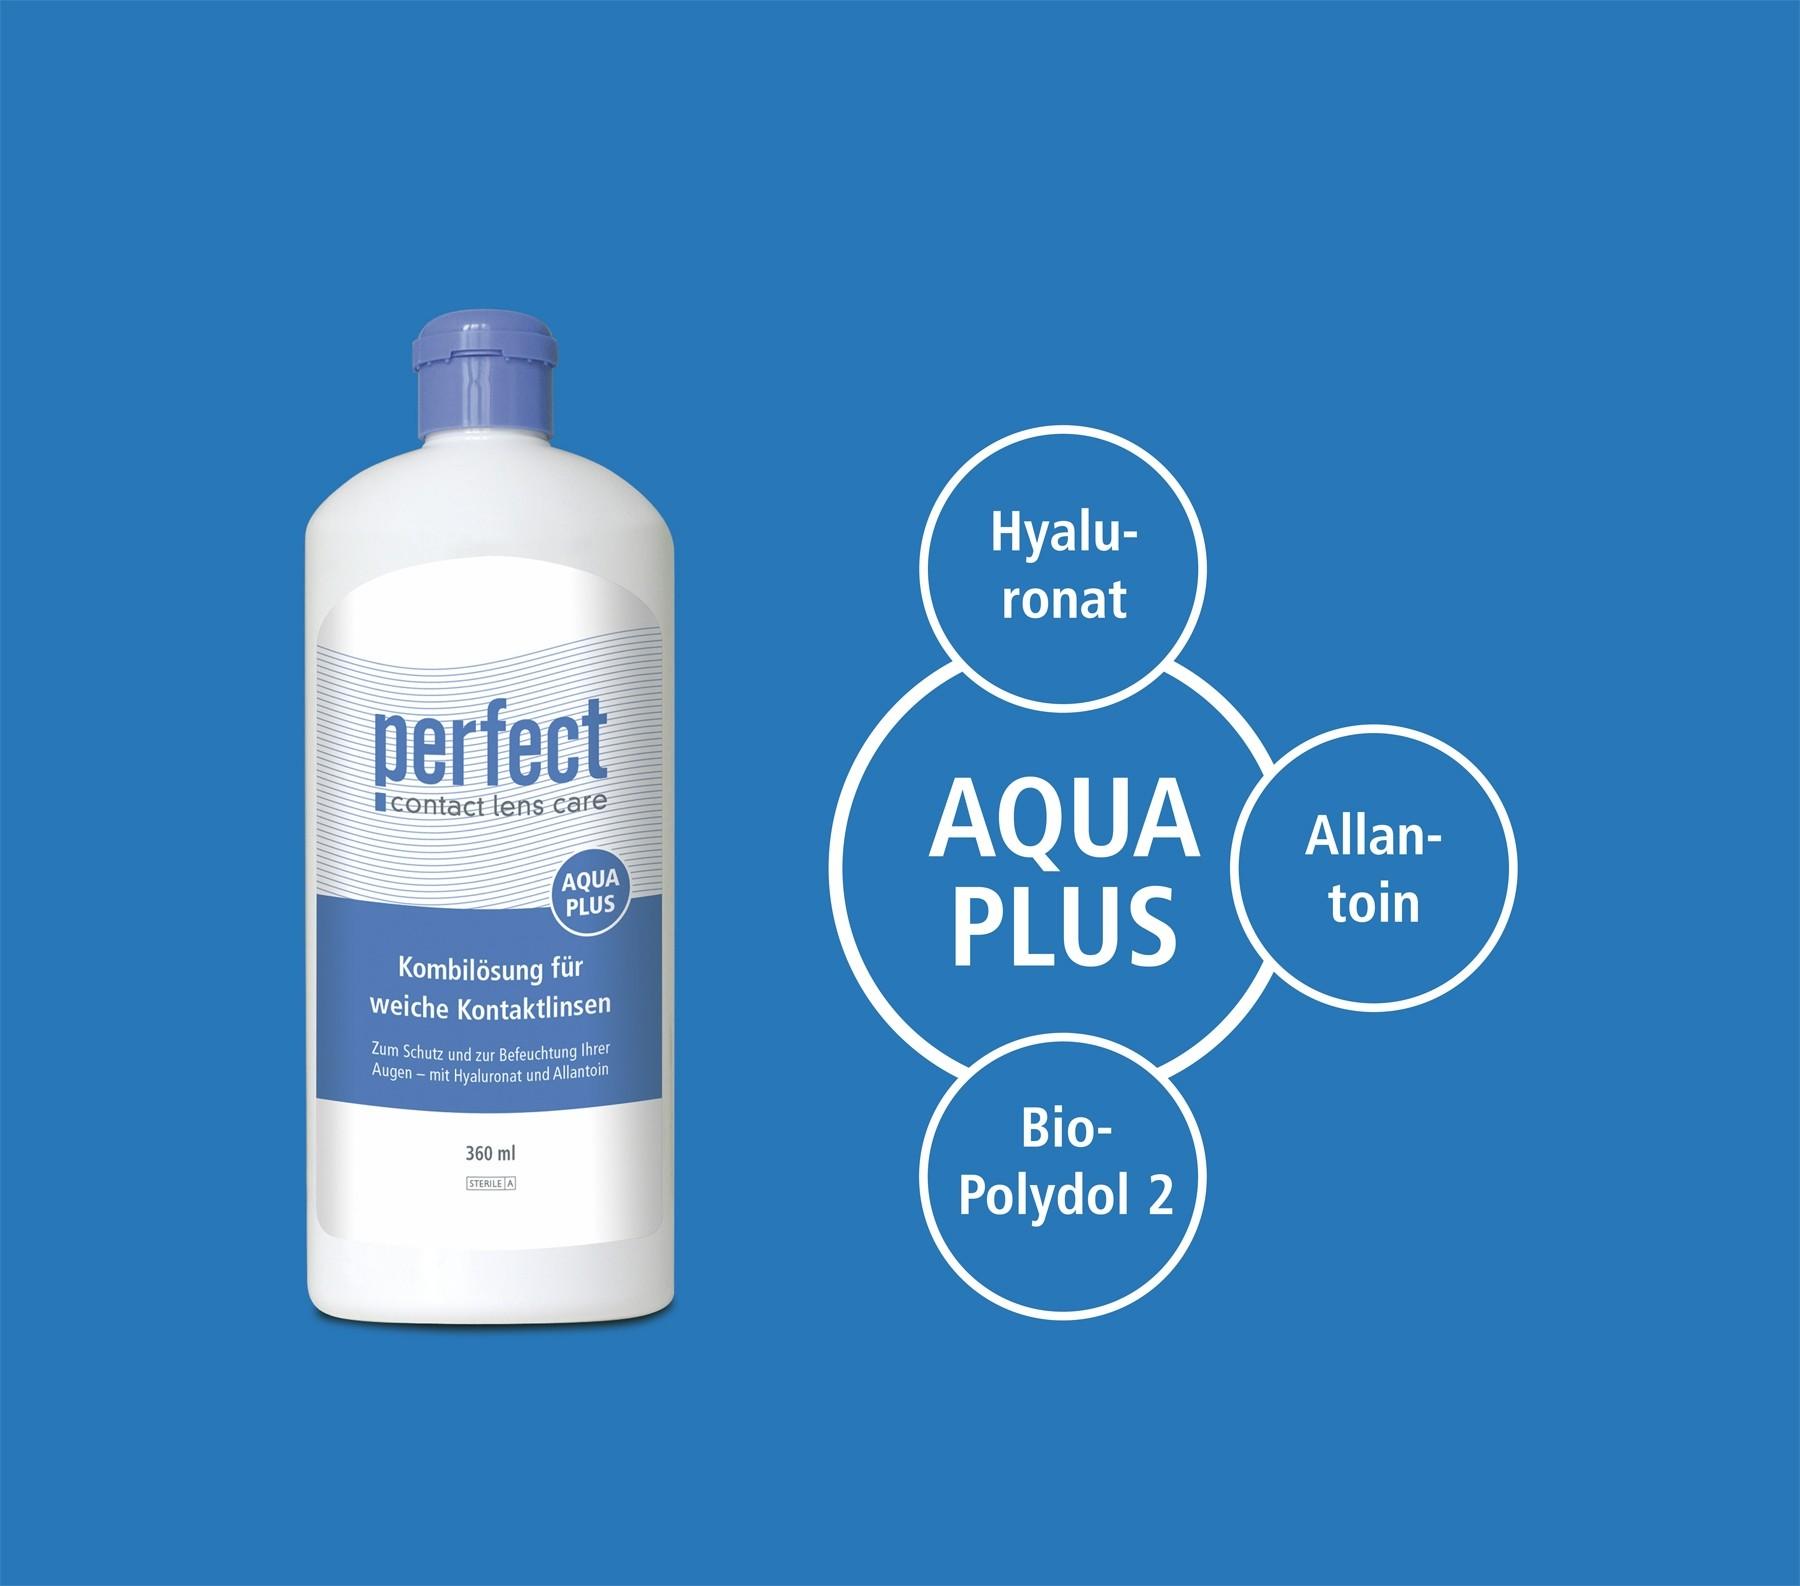 Lensbest-LensbestShop:/marken/mpge/Perfect Aqua Plus Grafik.jpg